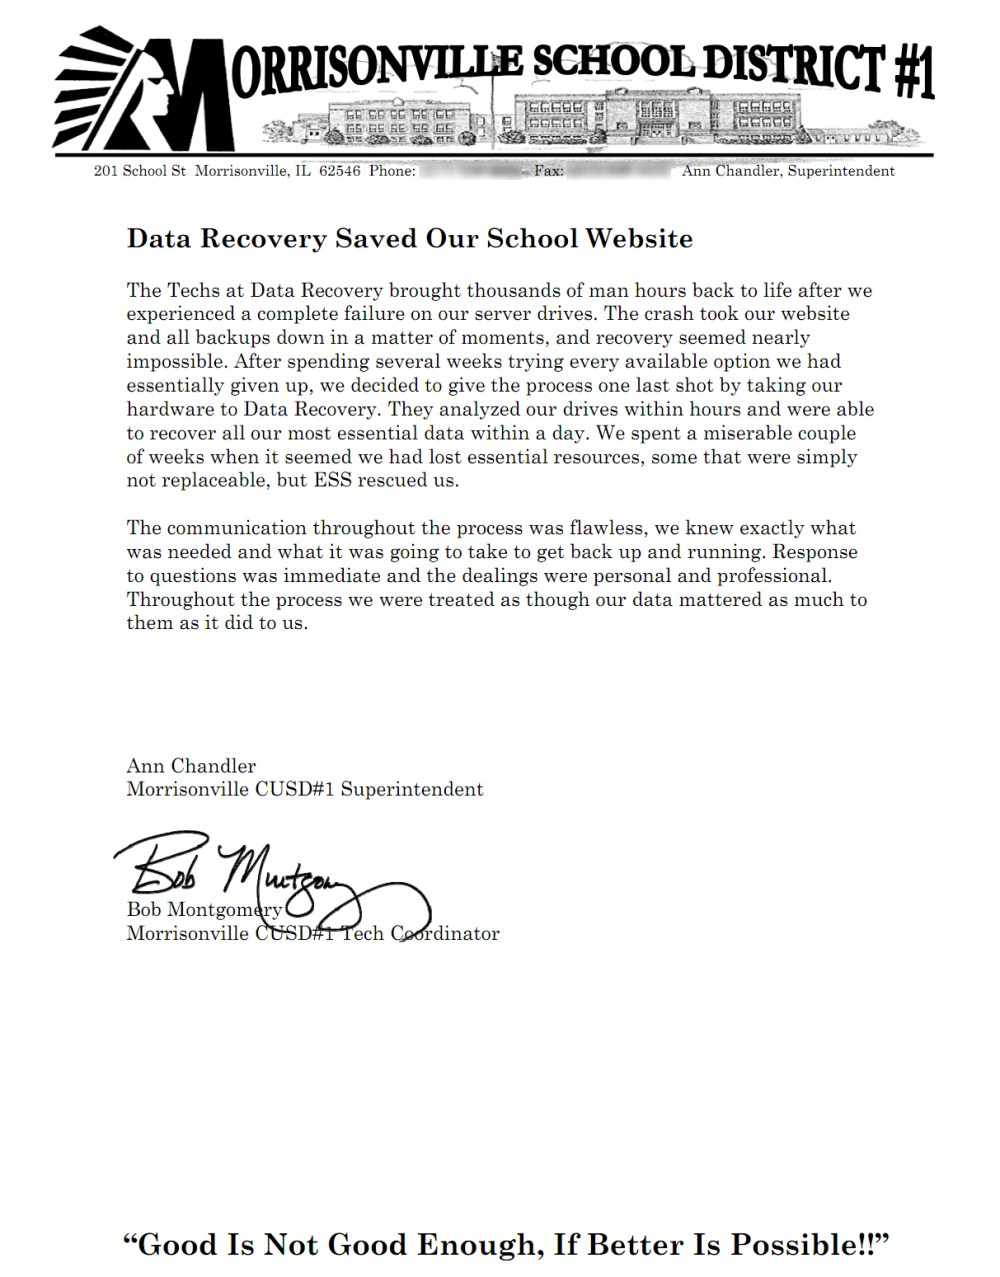 Morrisonville School District #1 testimonial